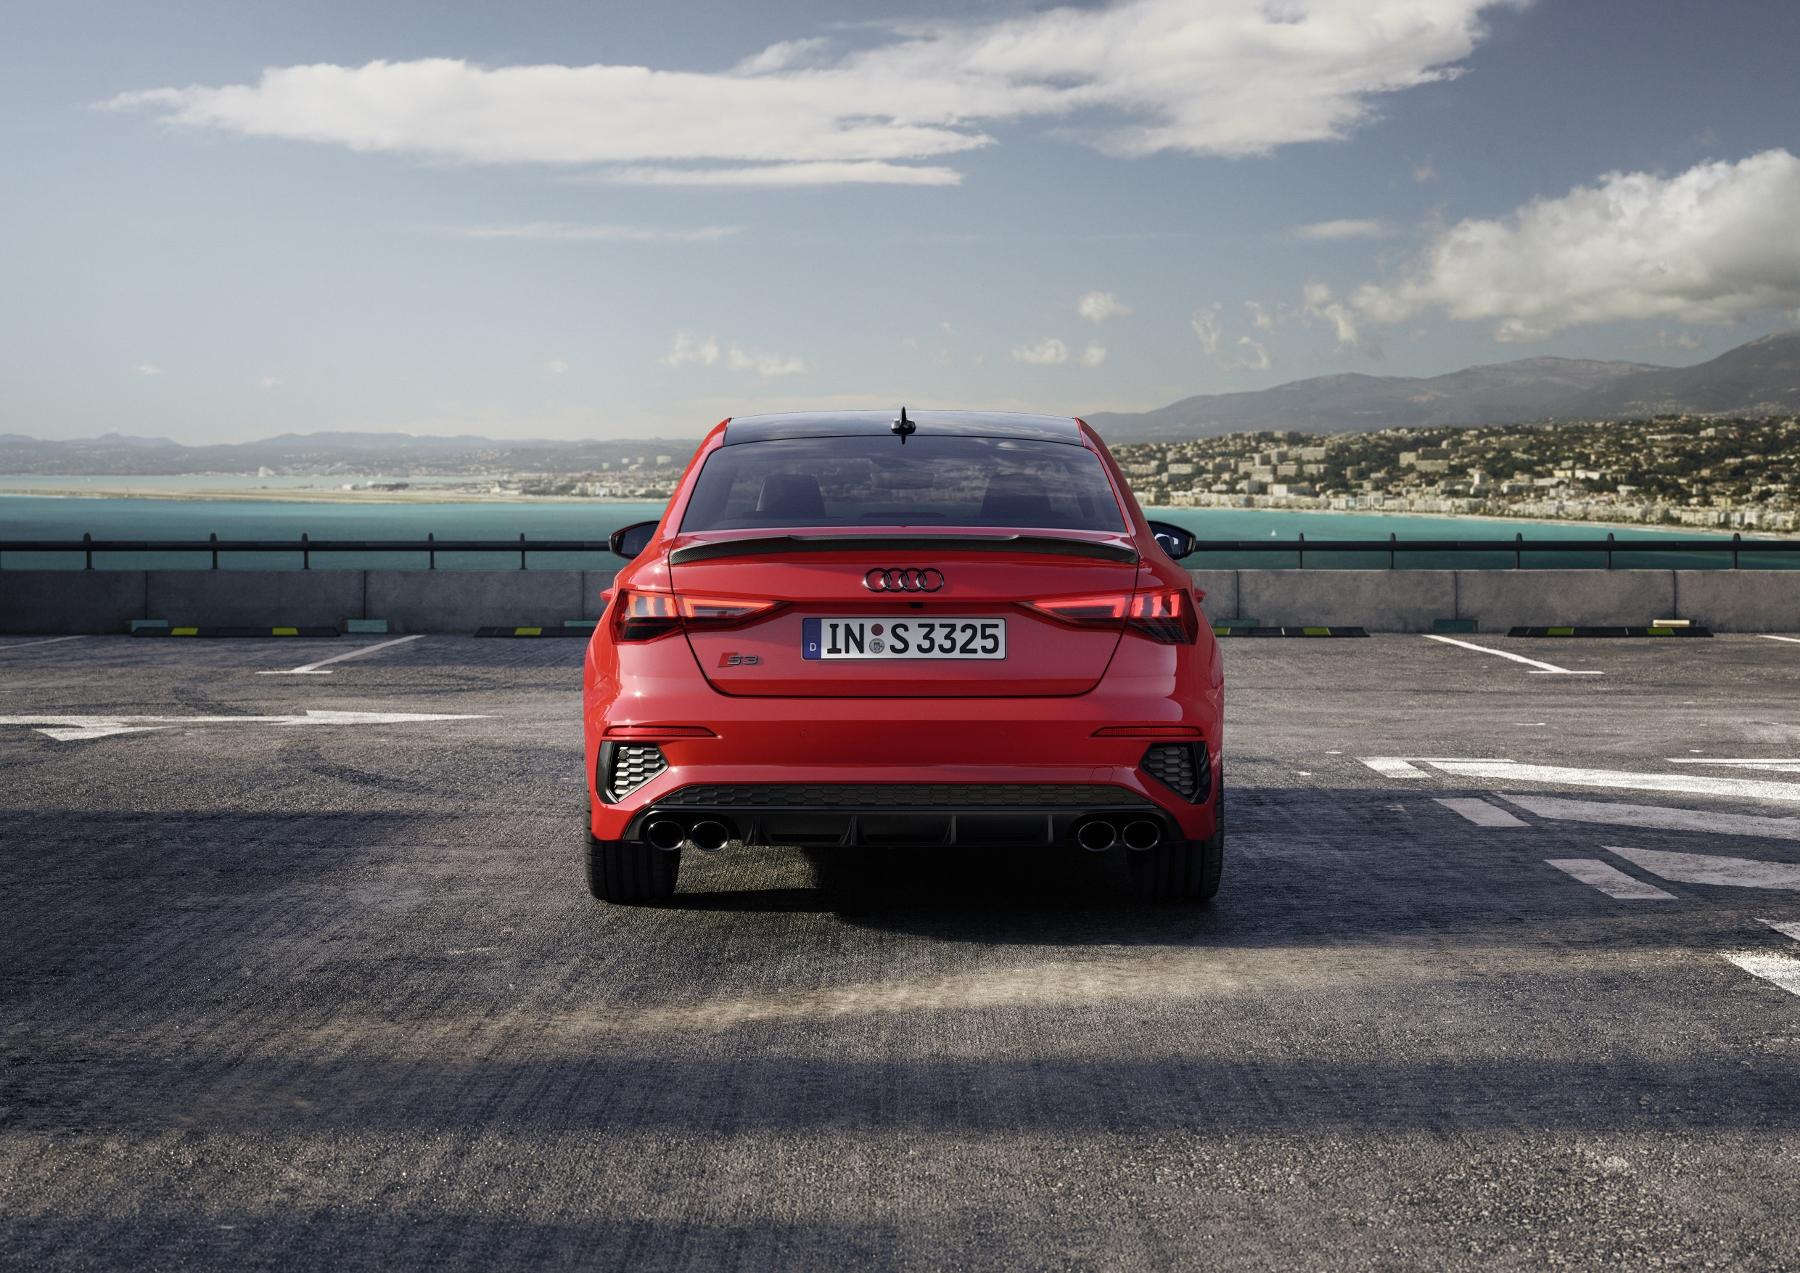 Audi ukázalo modely S3 Sedan a Sportback. Prezradilo aj nemeckú cenu xBeQifG5DR a204365large-1800x12